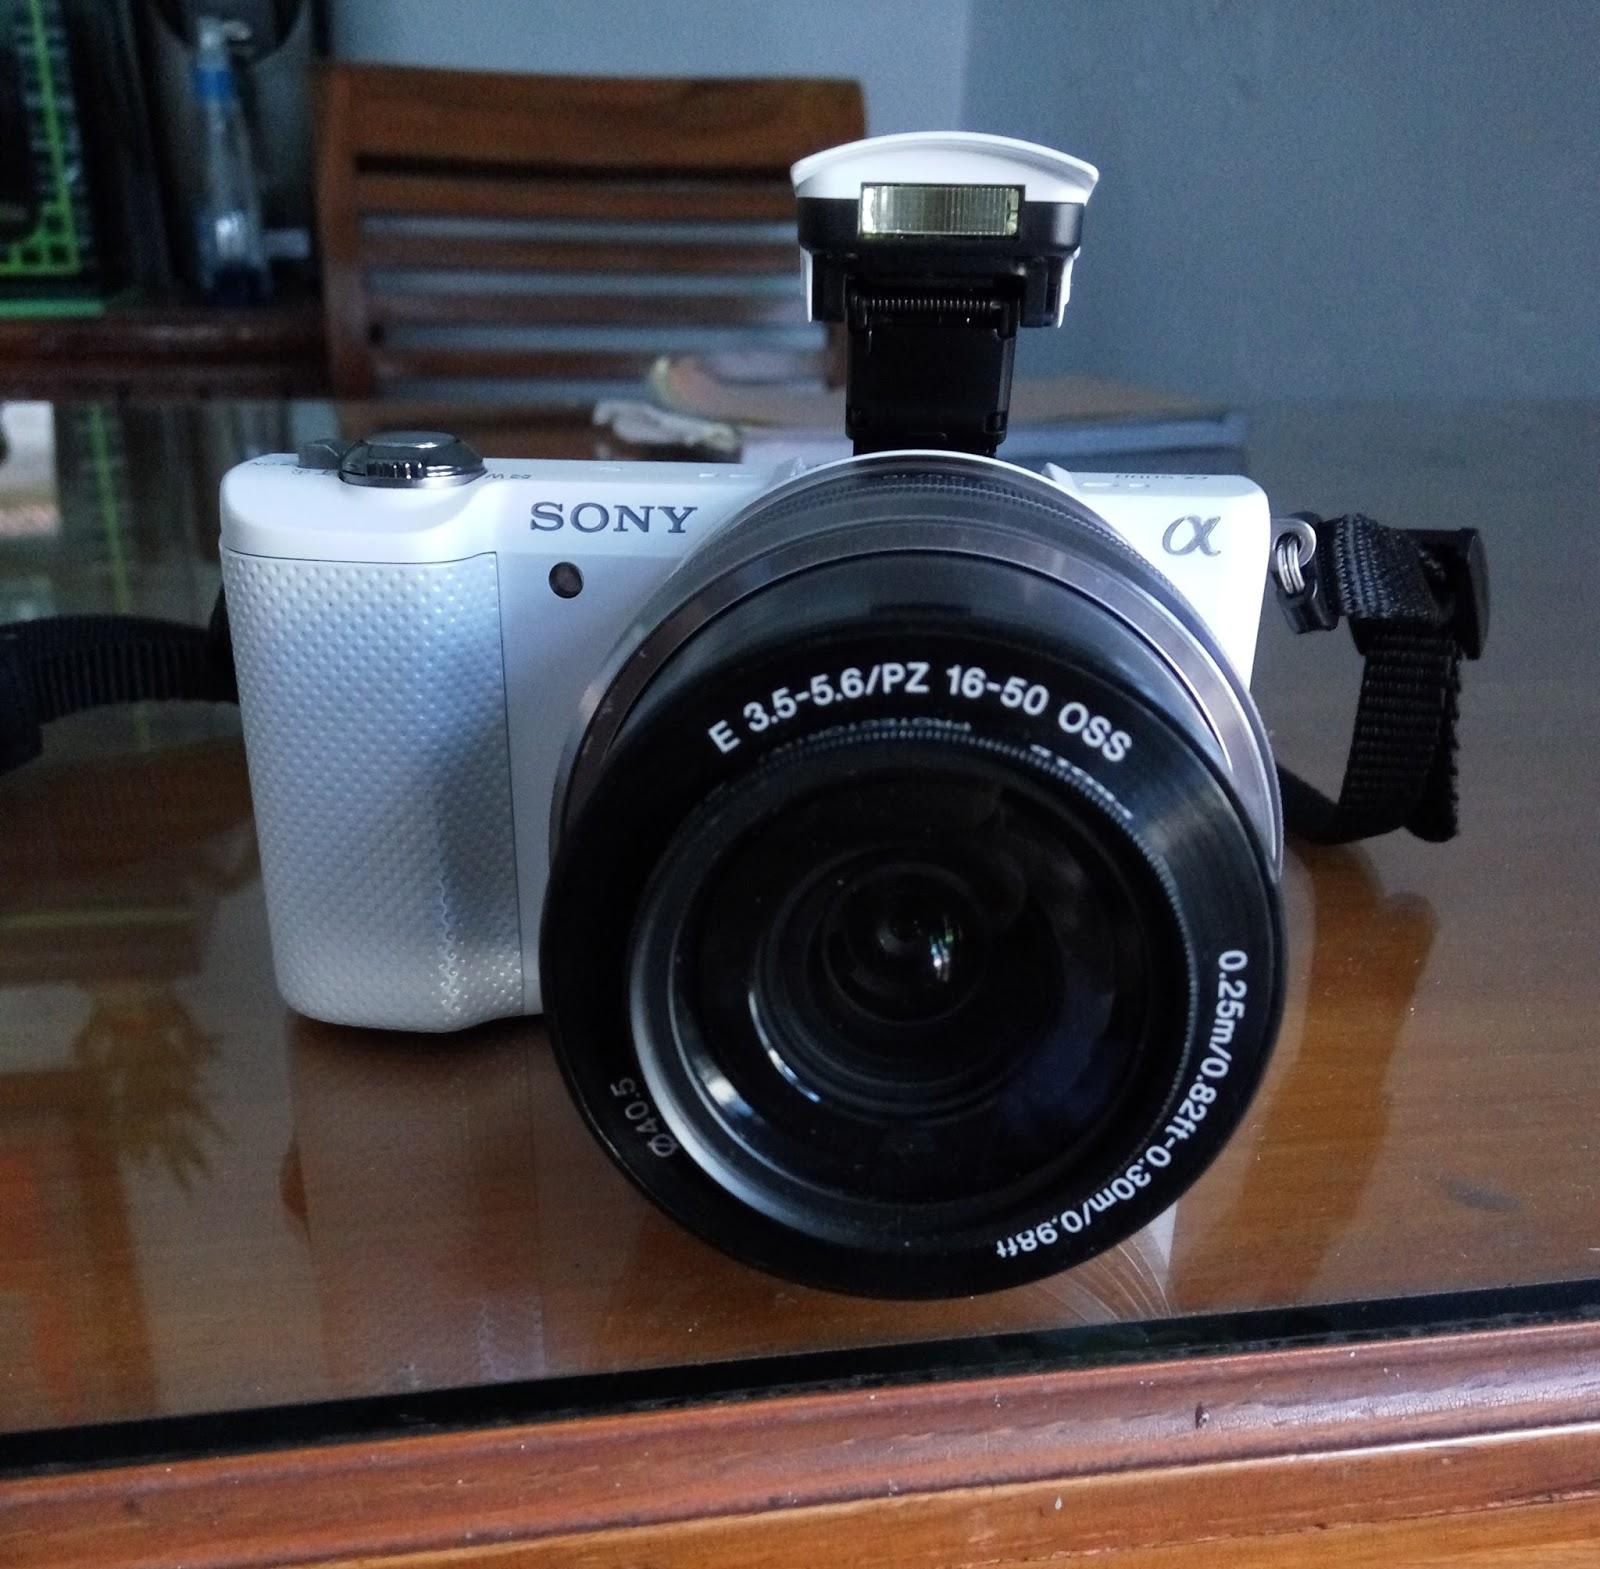 Jual Kamera Mirrorless Sony Alpha 5000 Putih Mulus Lus